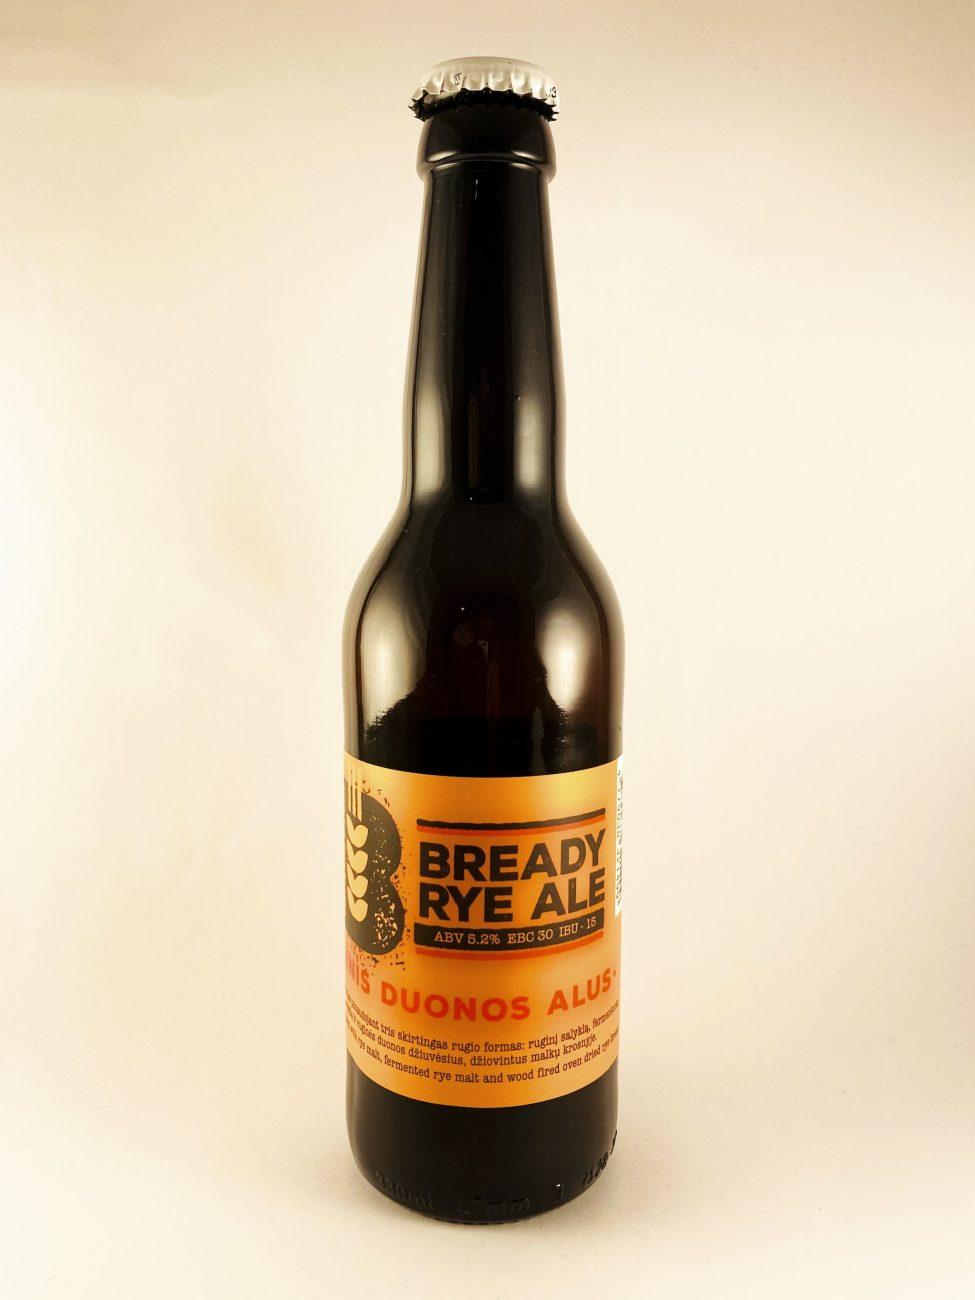 Bready-rye-ale